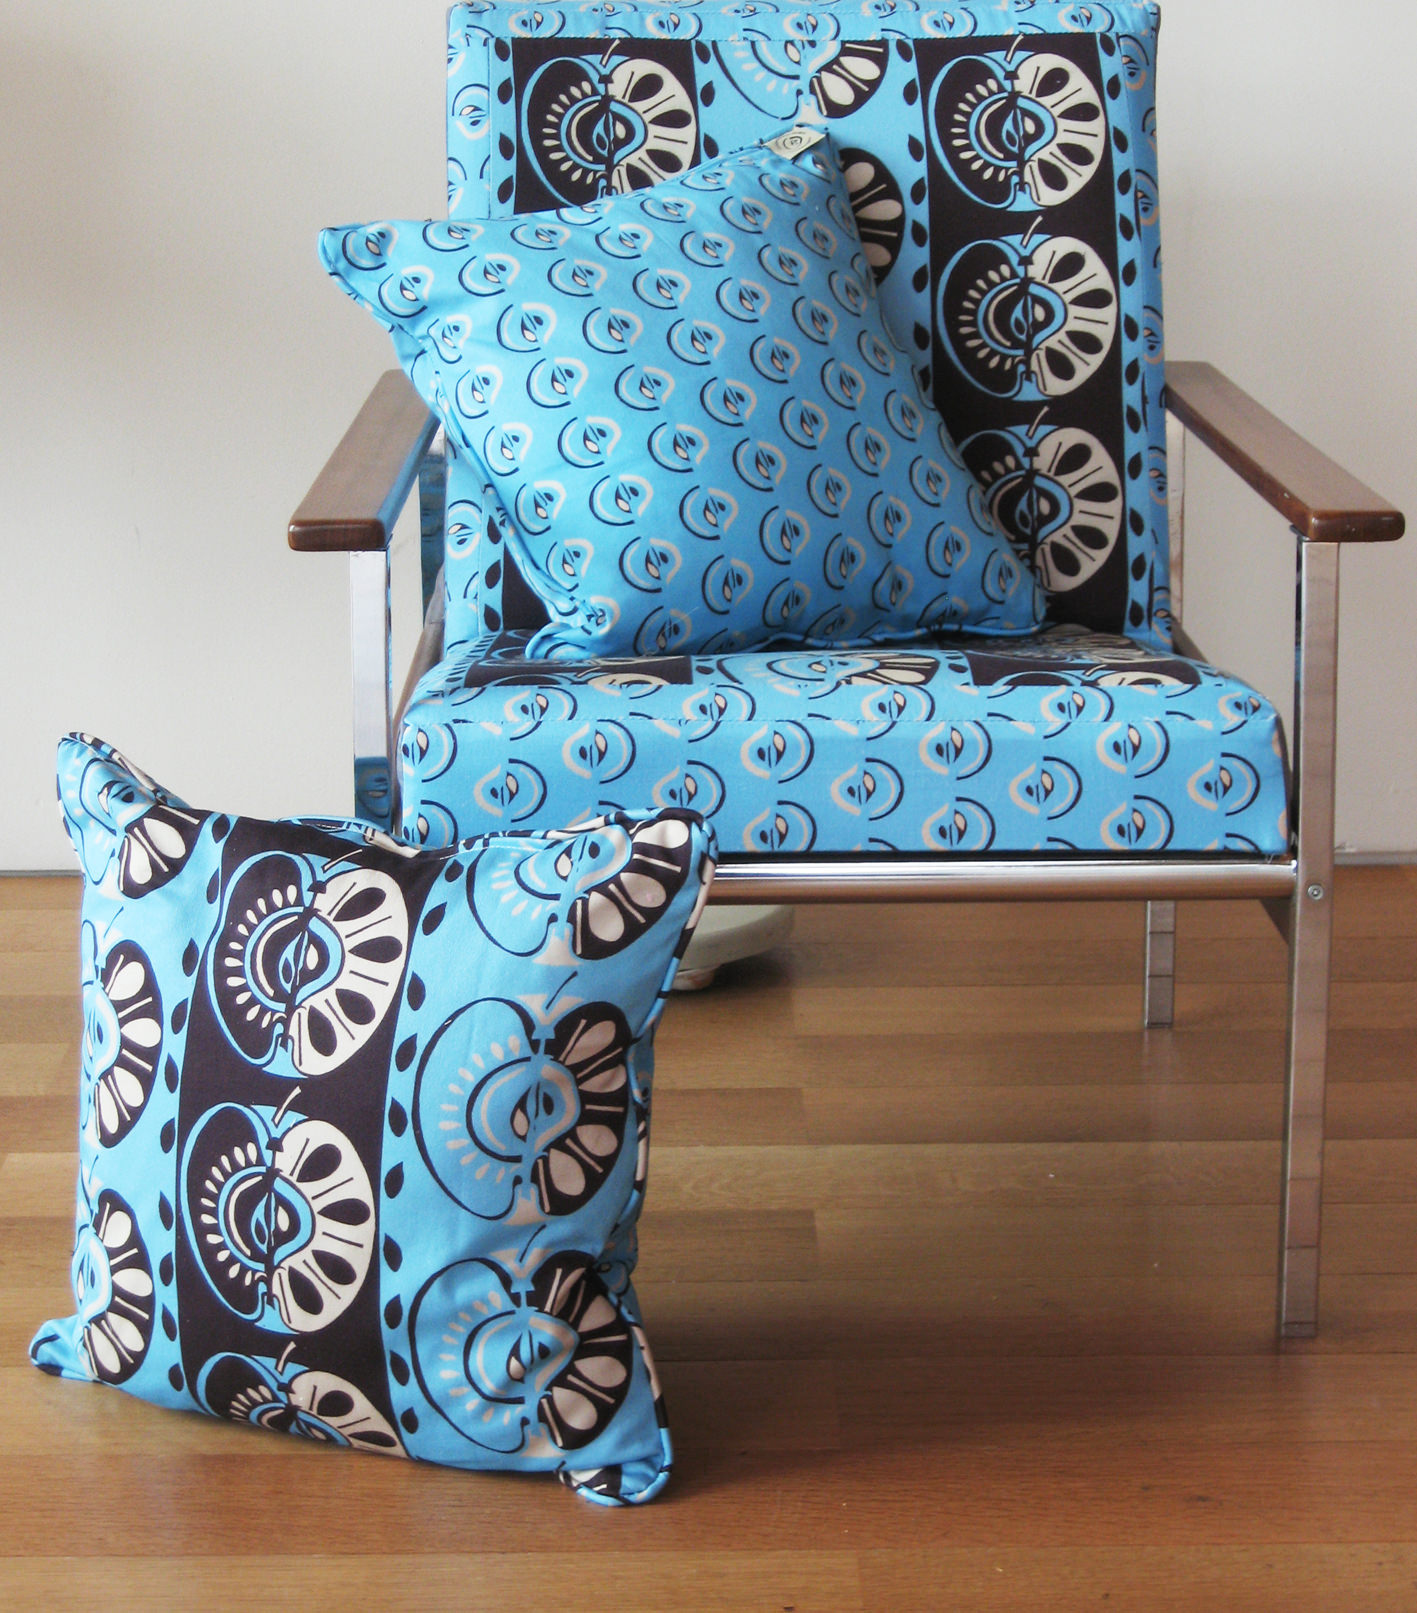 retro chair and cushion in apple blue fabric.jpg